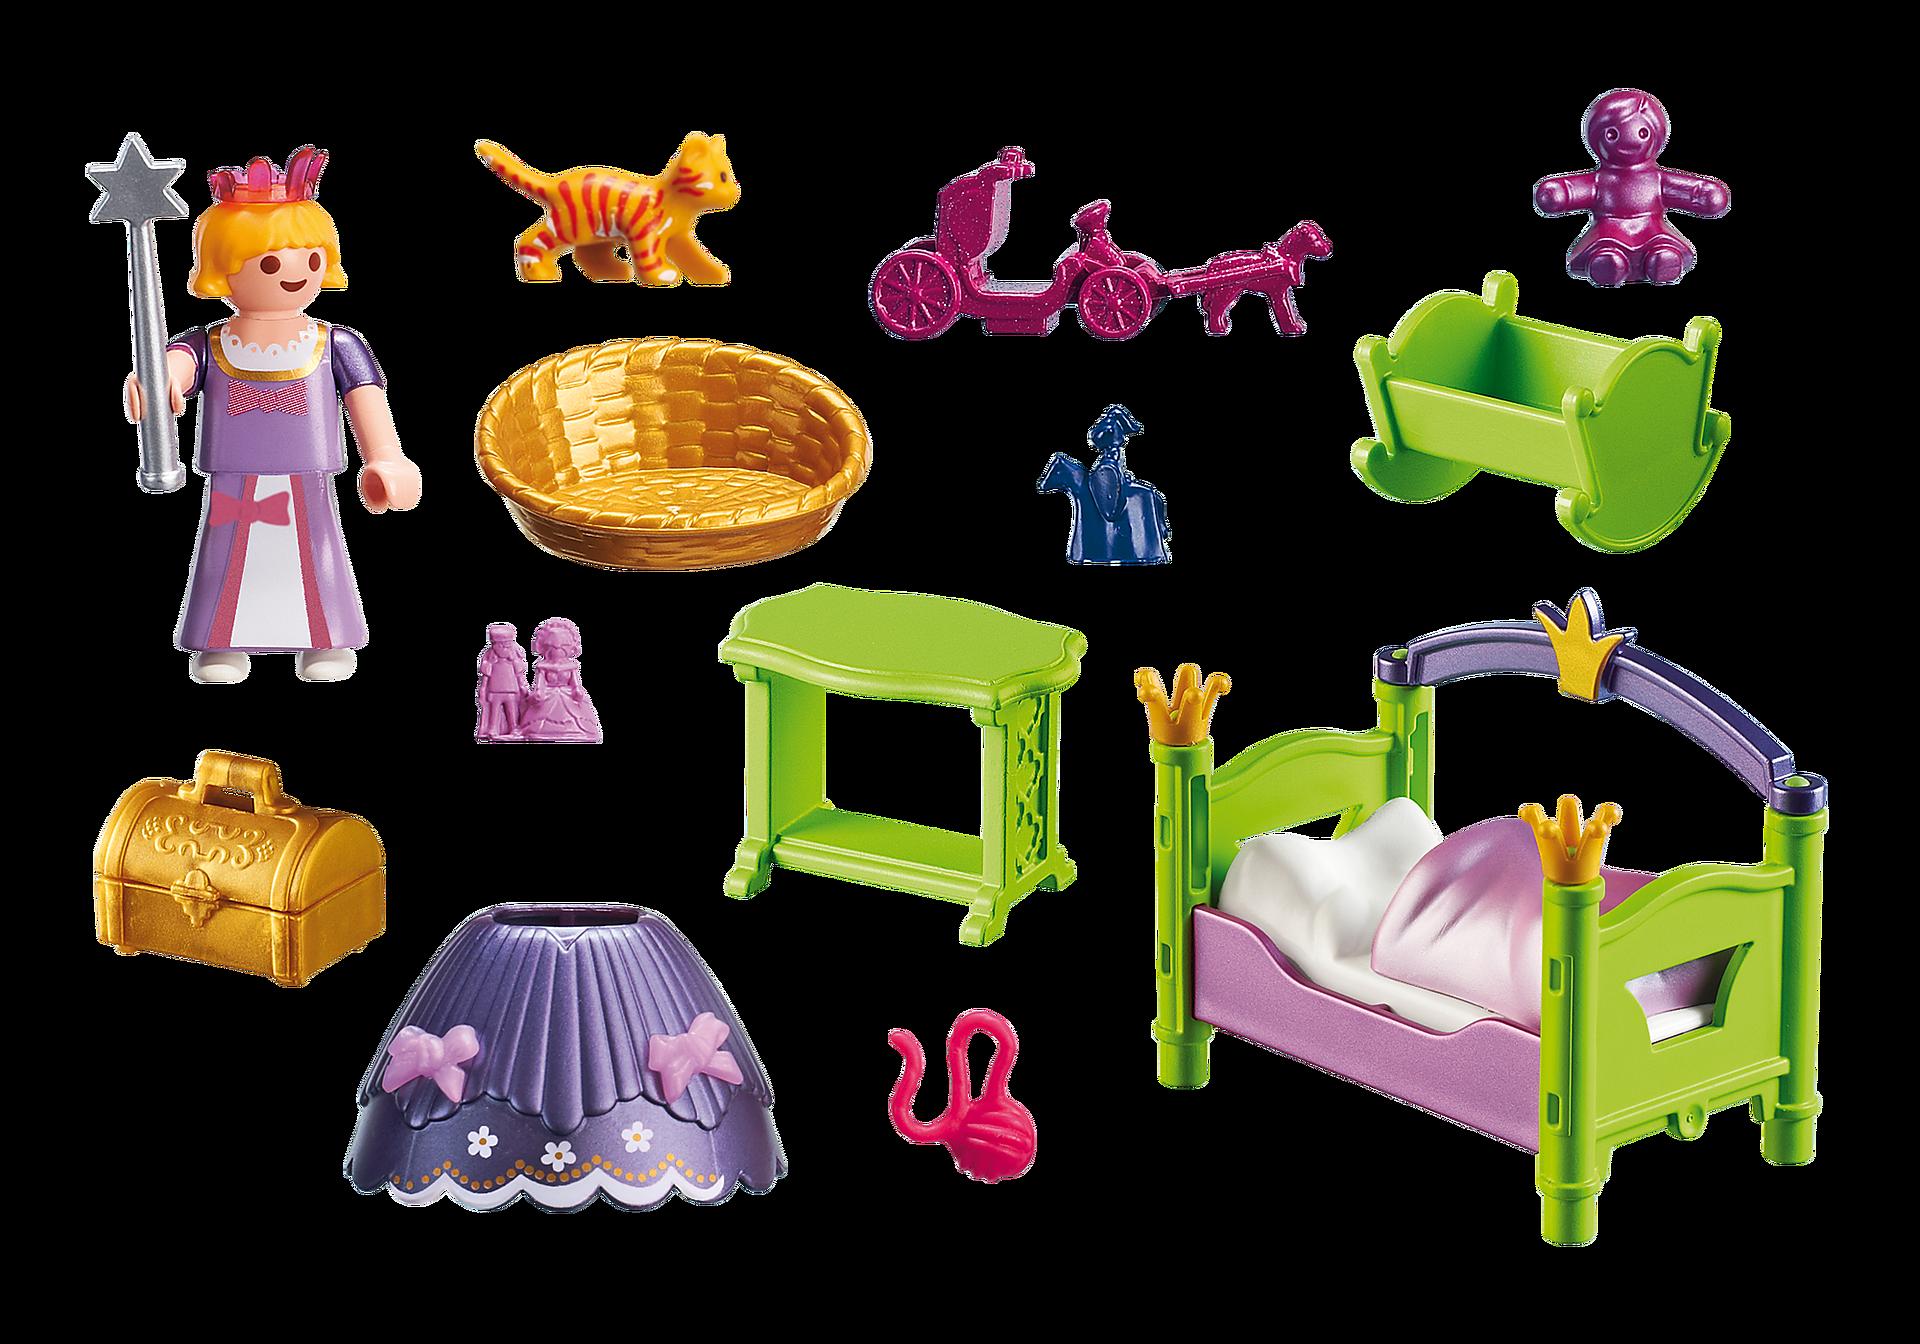 http://media.playmobil.com/i/playmobil/6852_product_box_back/Замок Принцессы: Королевская няня